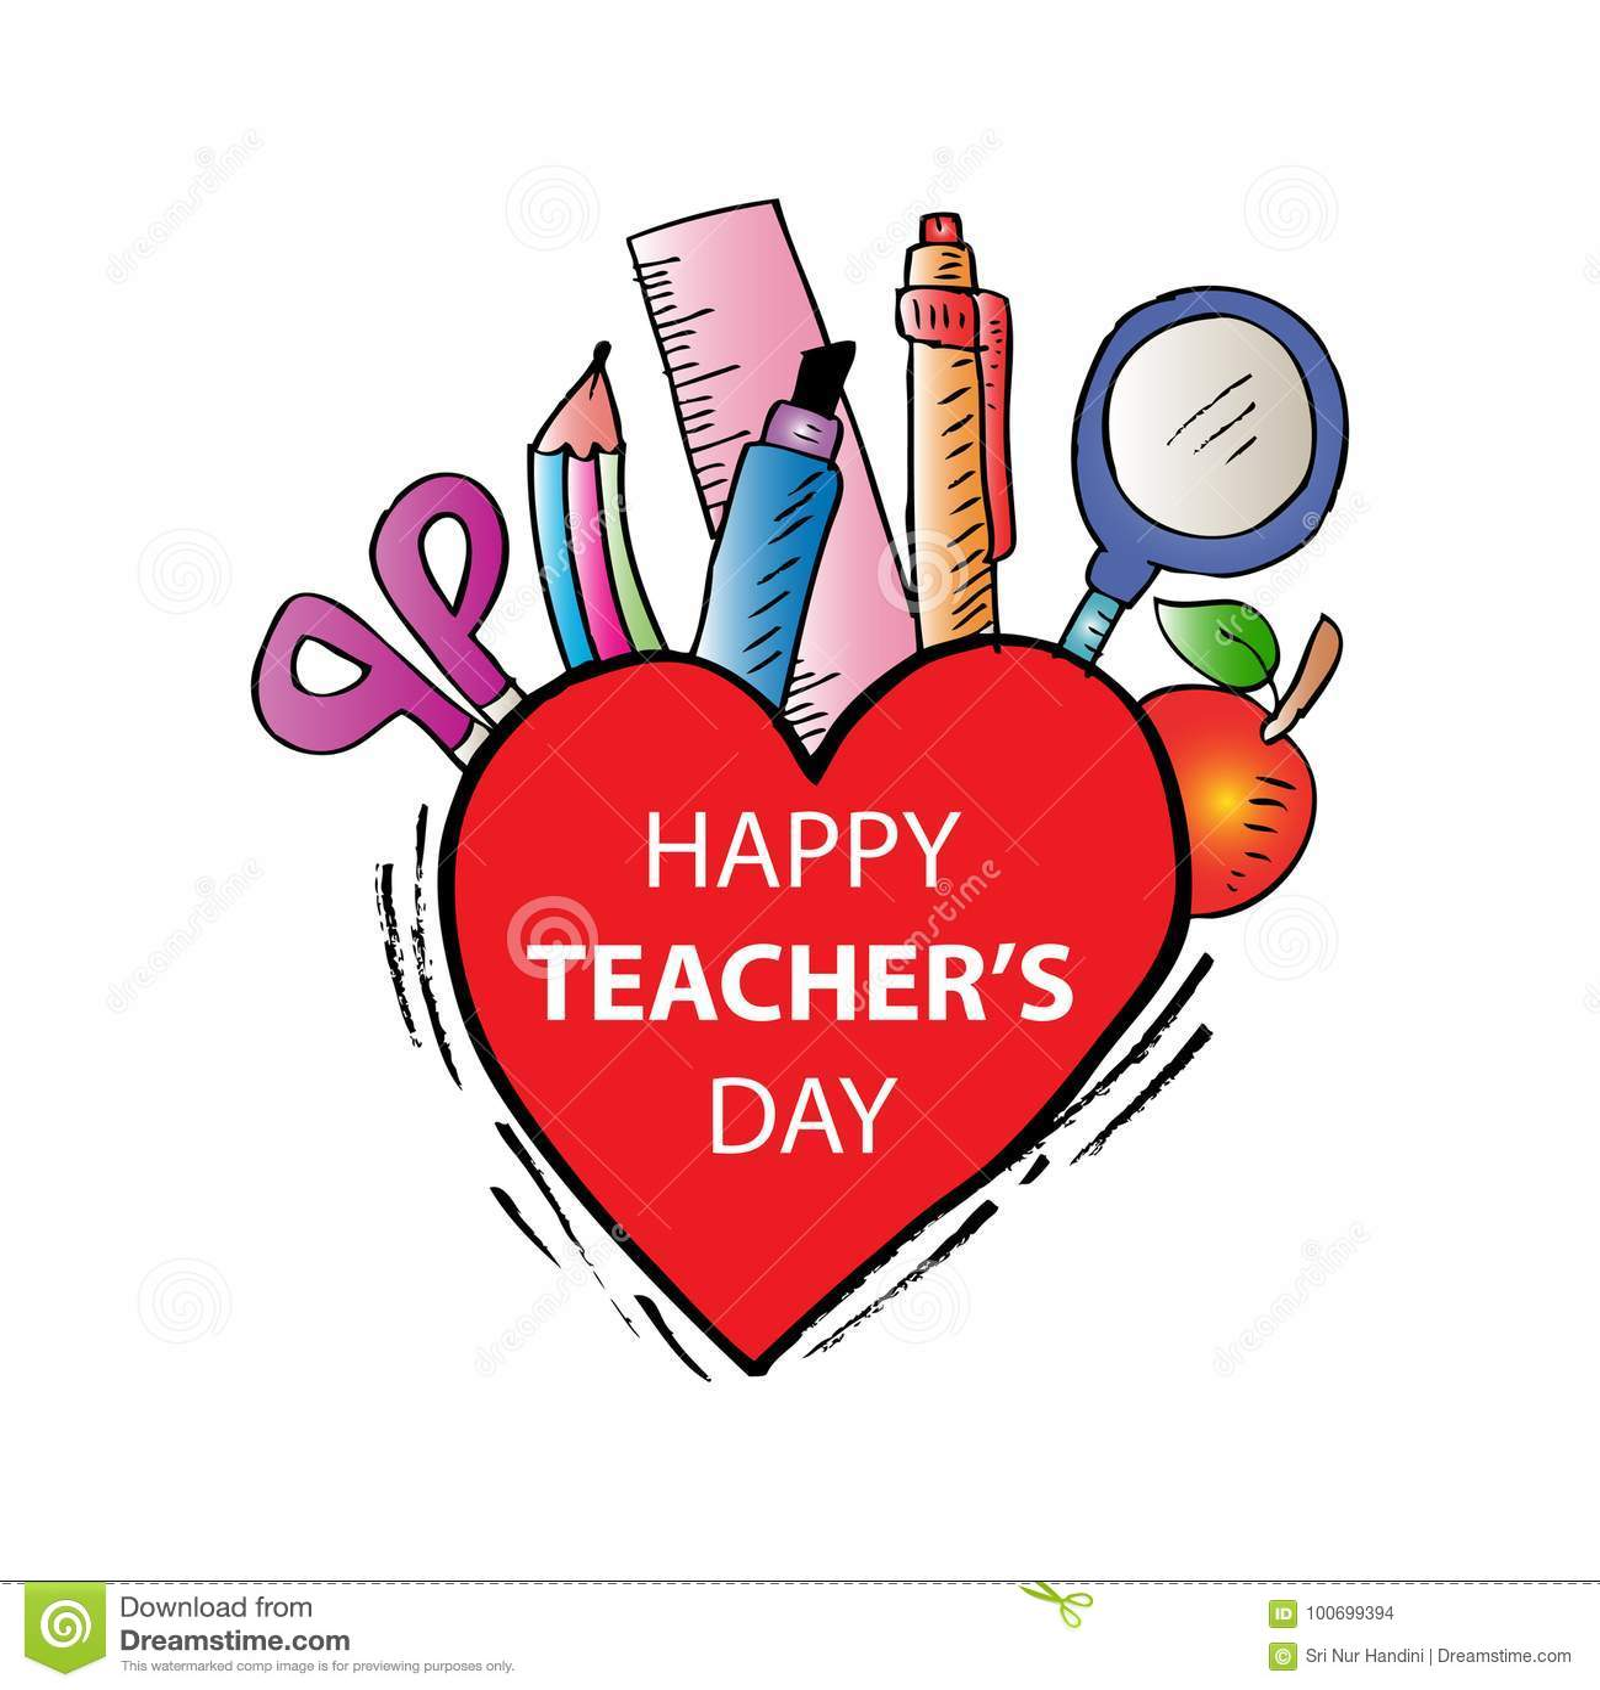 Happy teachers day stock vector  Illustration of concept